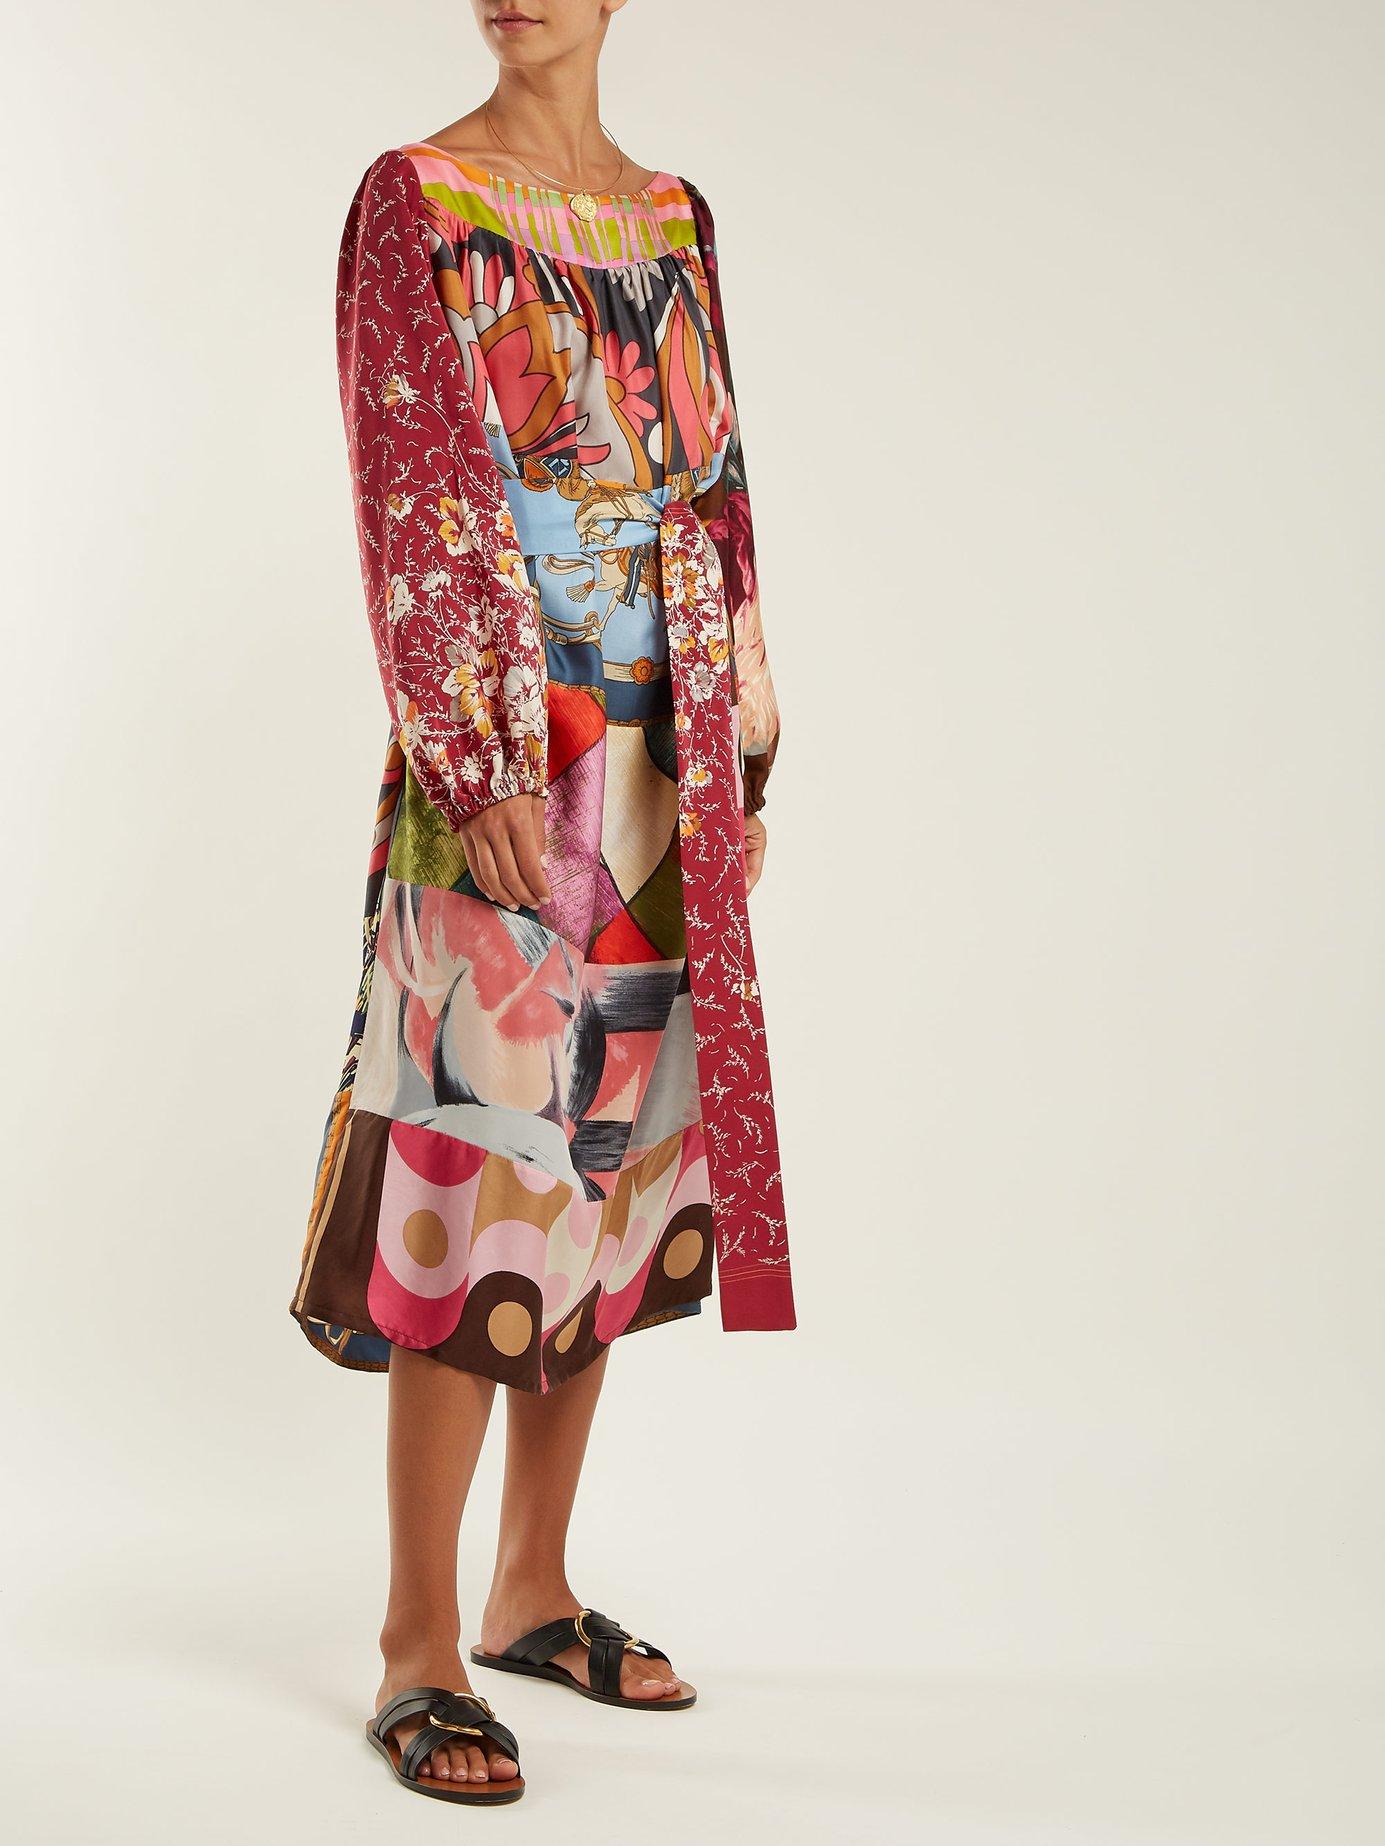 Patchwork vintage silk-twill dress by Rianna + Nina